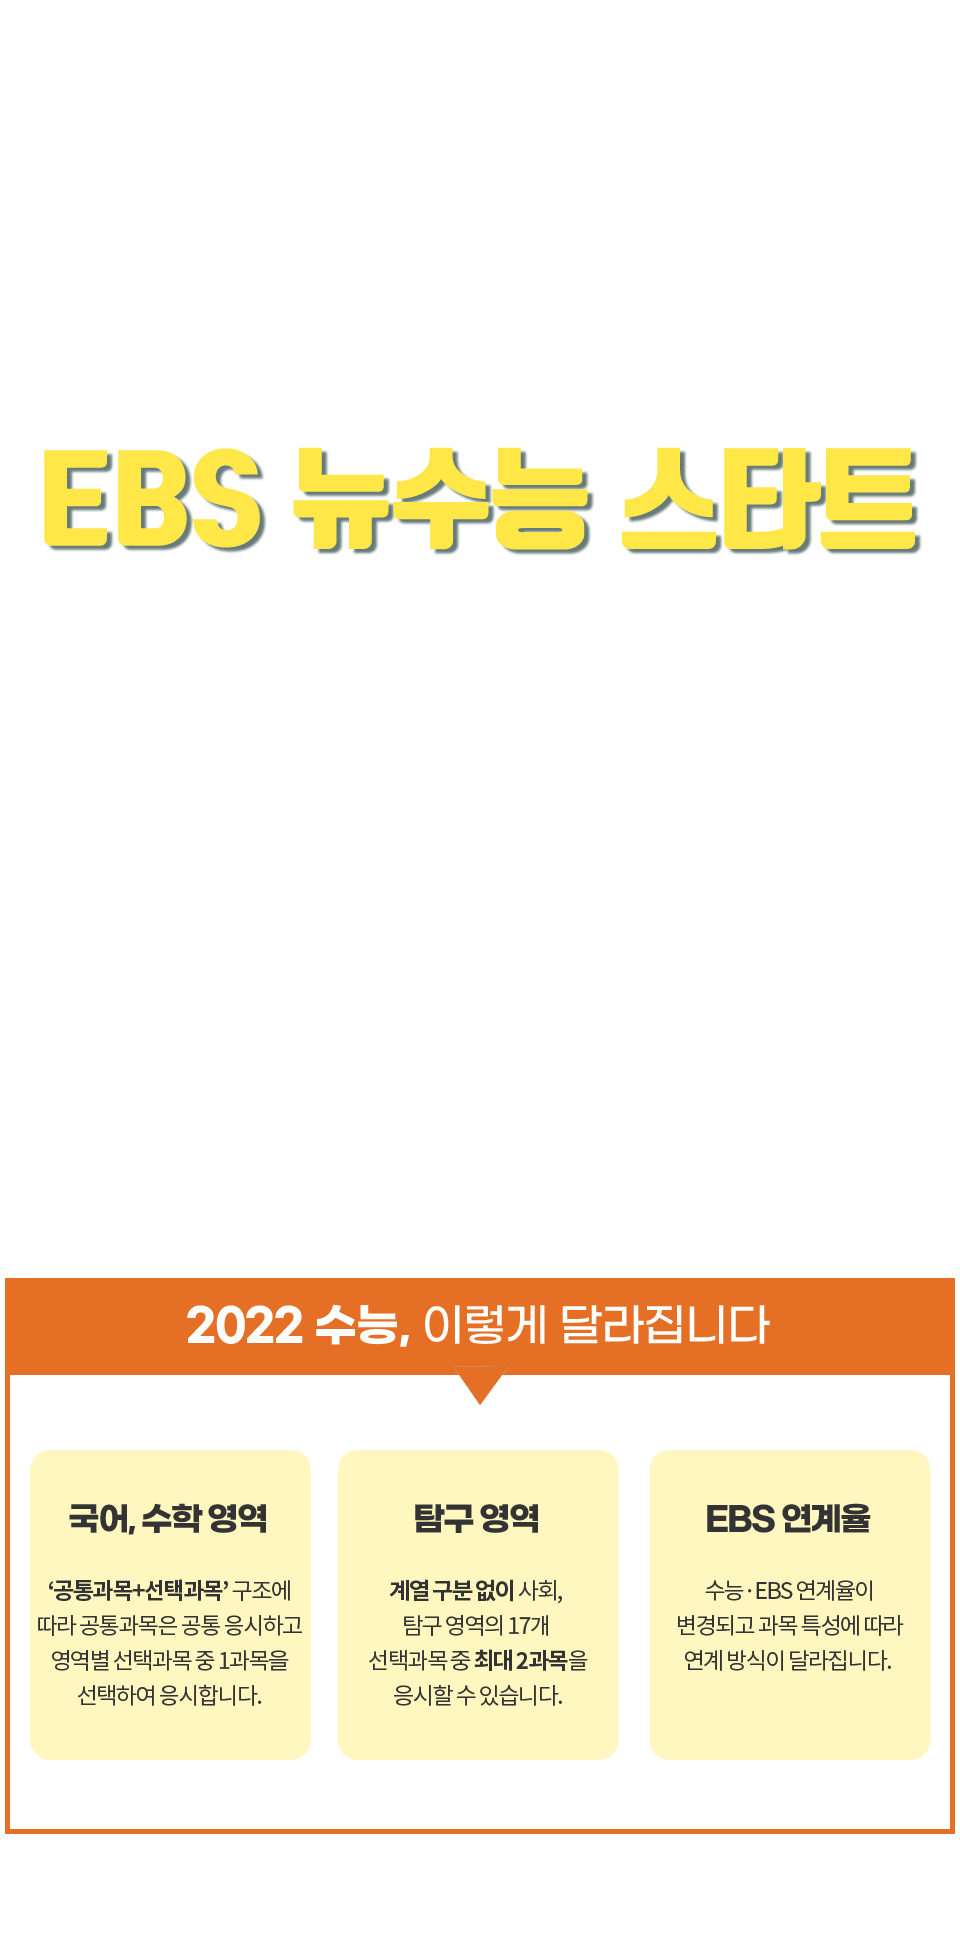 EBS 뉴수능 스타트